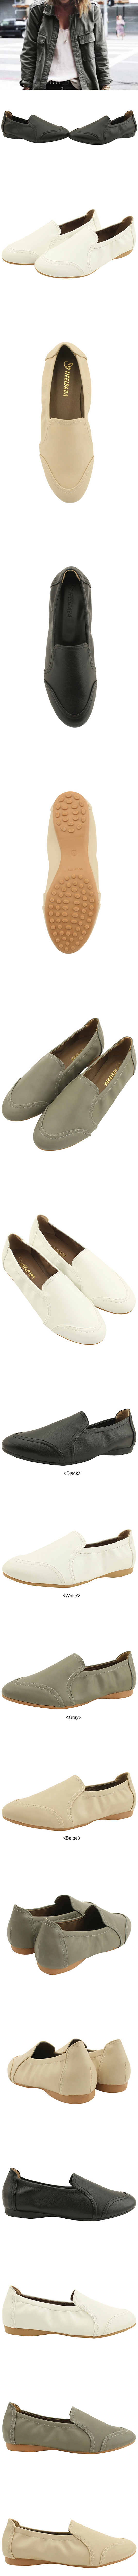 Banding soft loafers shoes khaki